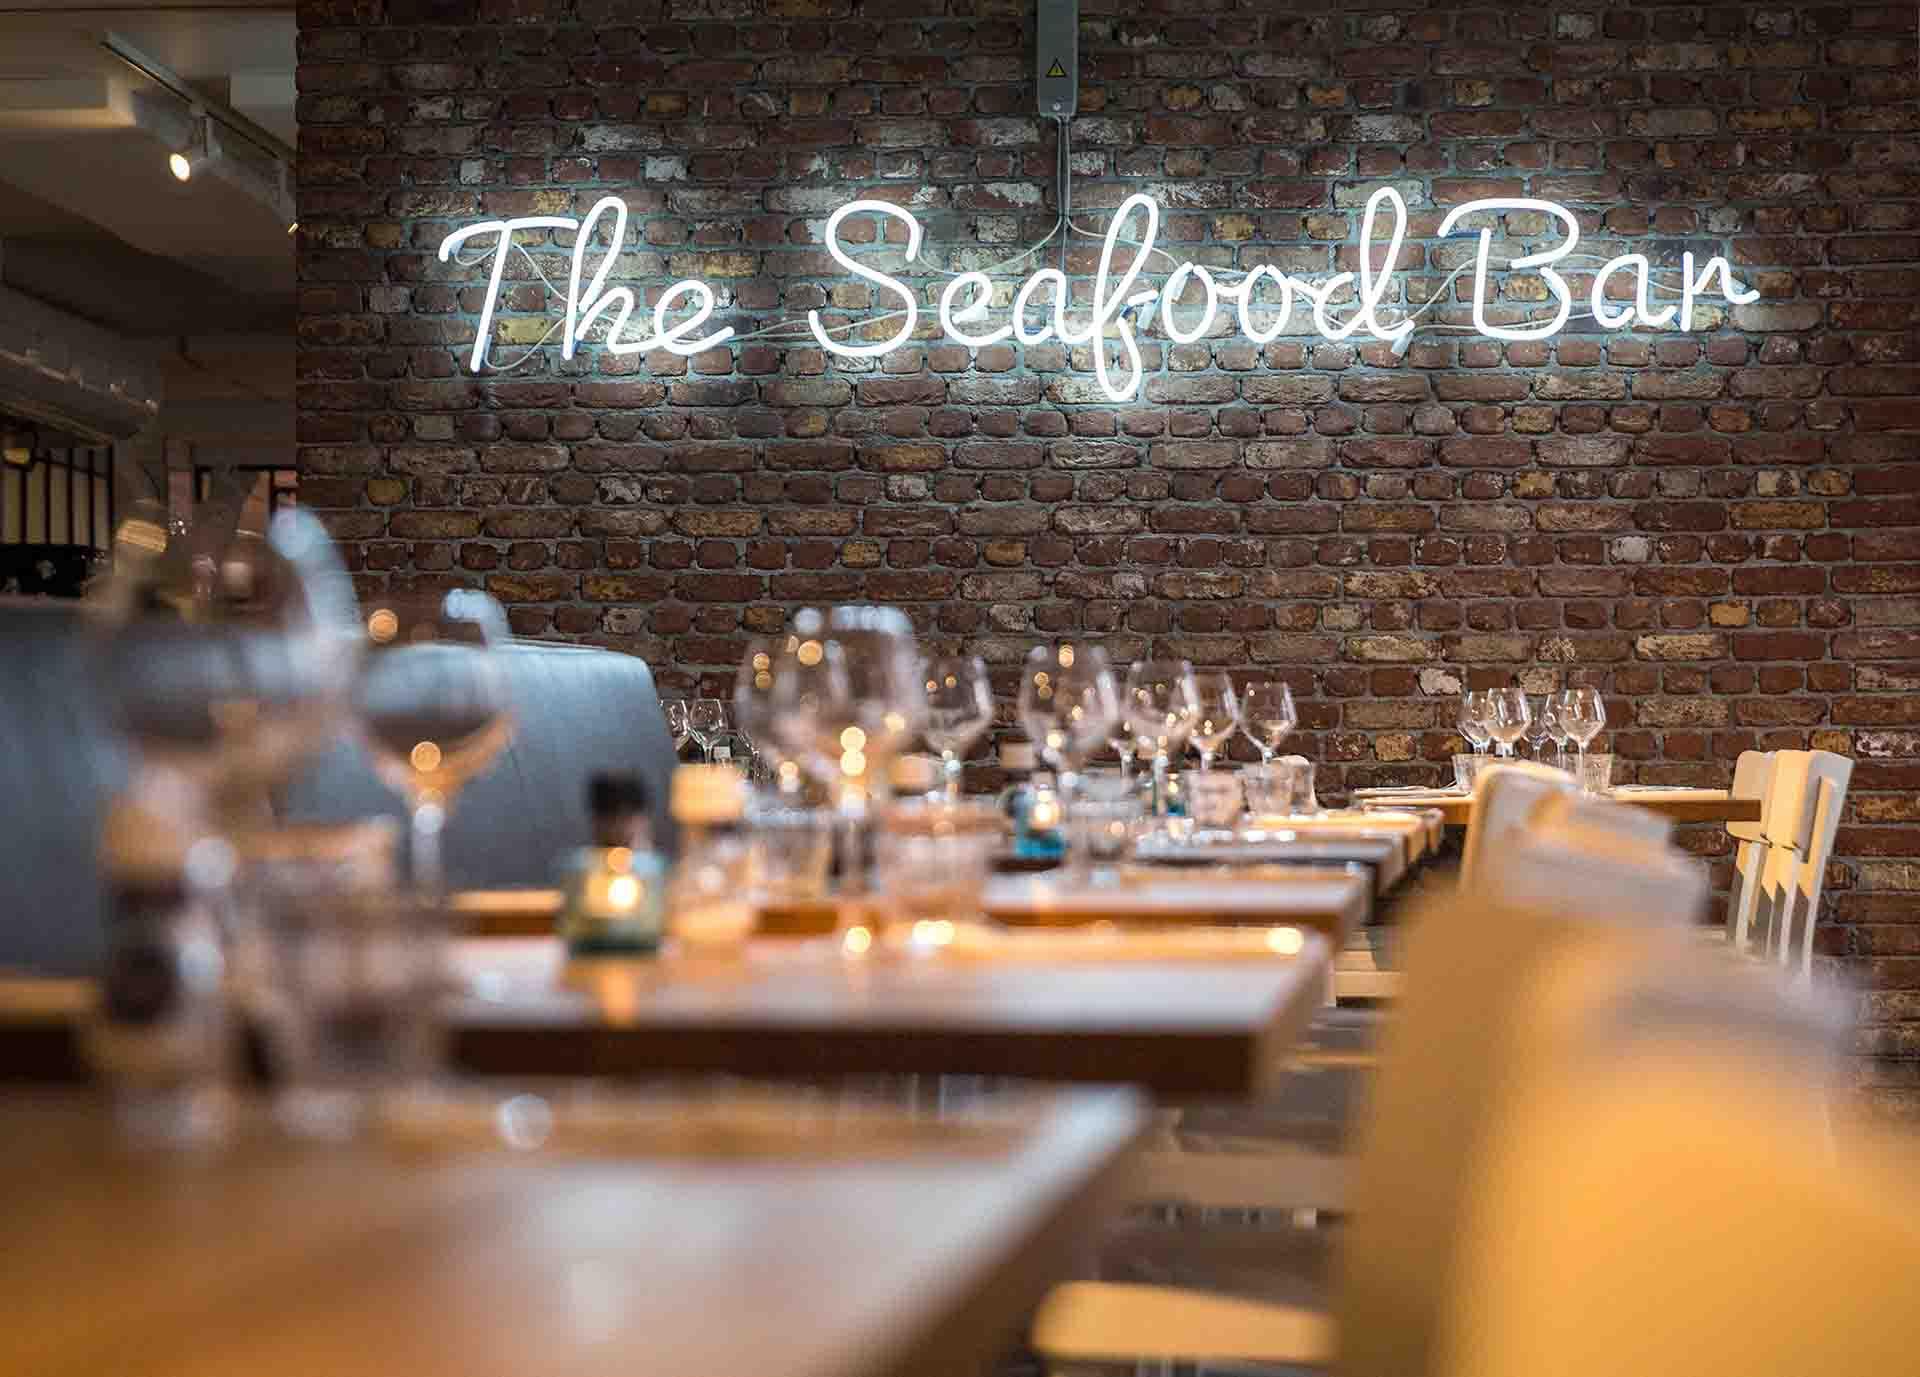 Seafood bar Amsterdam